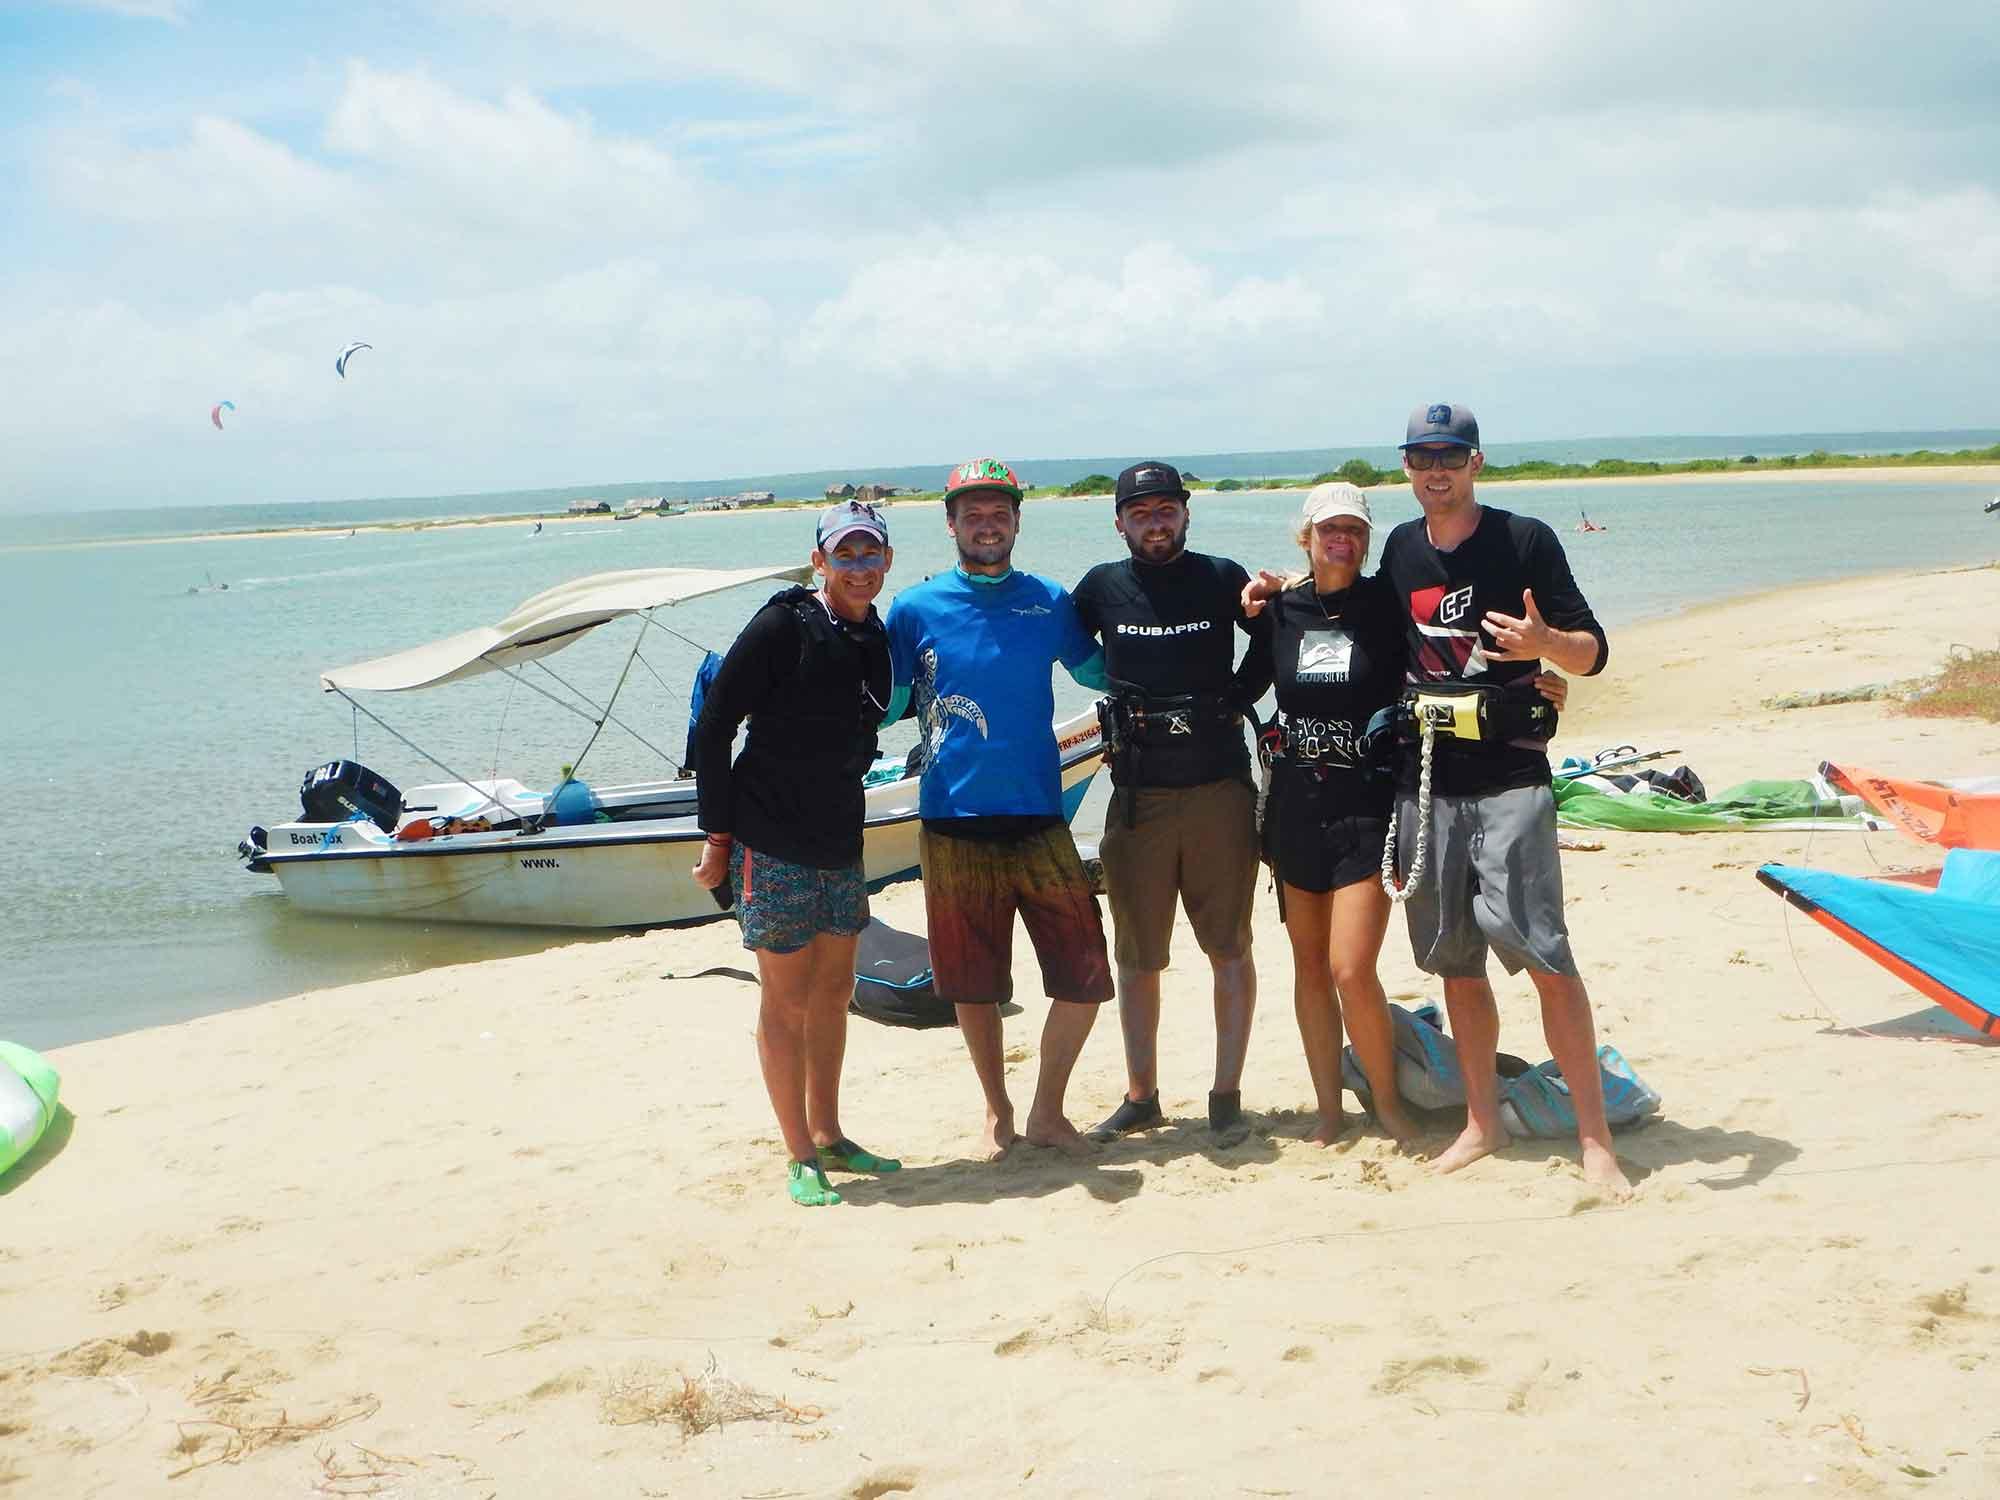 kitesurf school koh phangan - the team